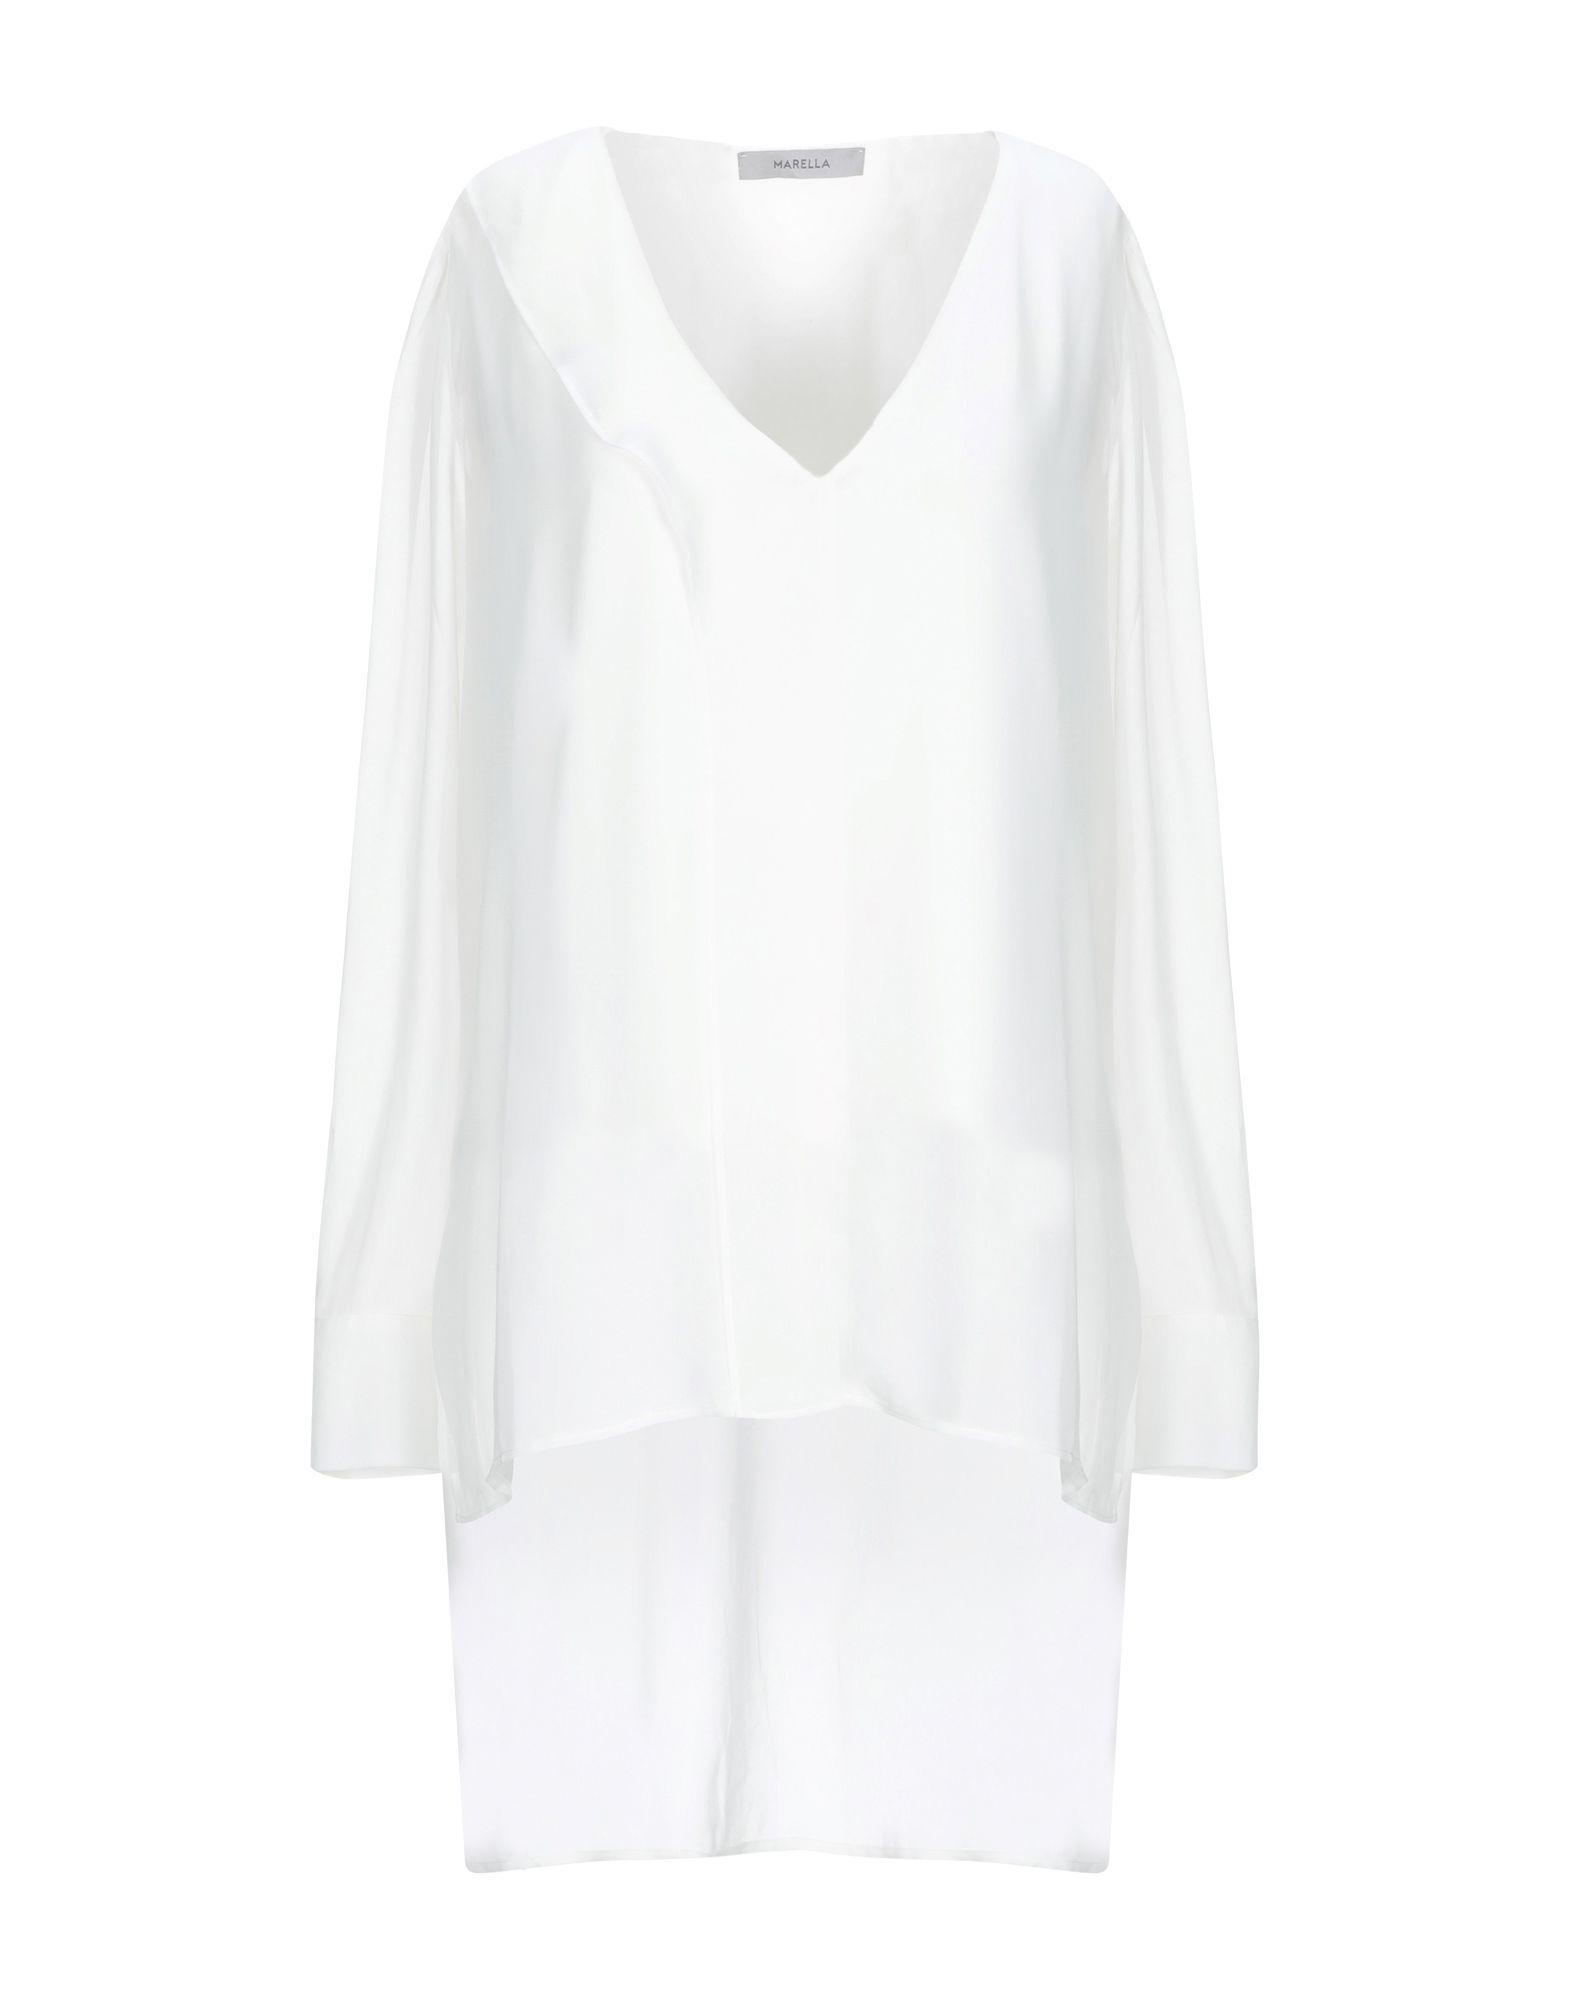 Фото - MARELLA Блузка marella sport блузка